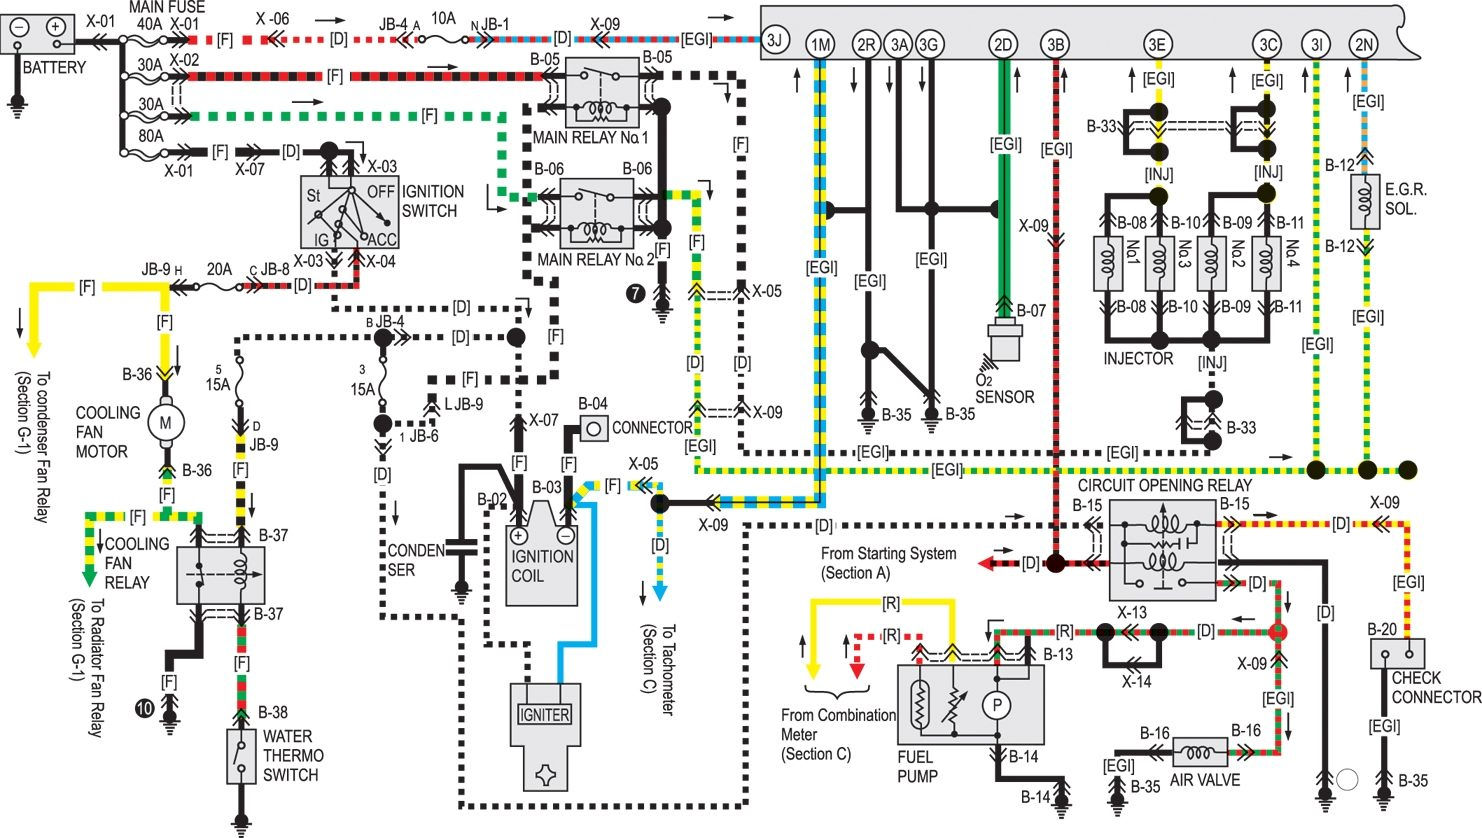 1992 Mazda B2200 Alternator Wiring Diagram 1987 B2000 Diagrams 87 Ignition